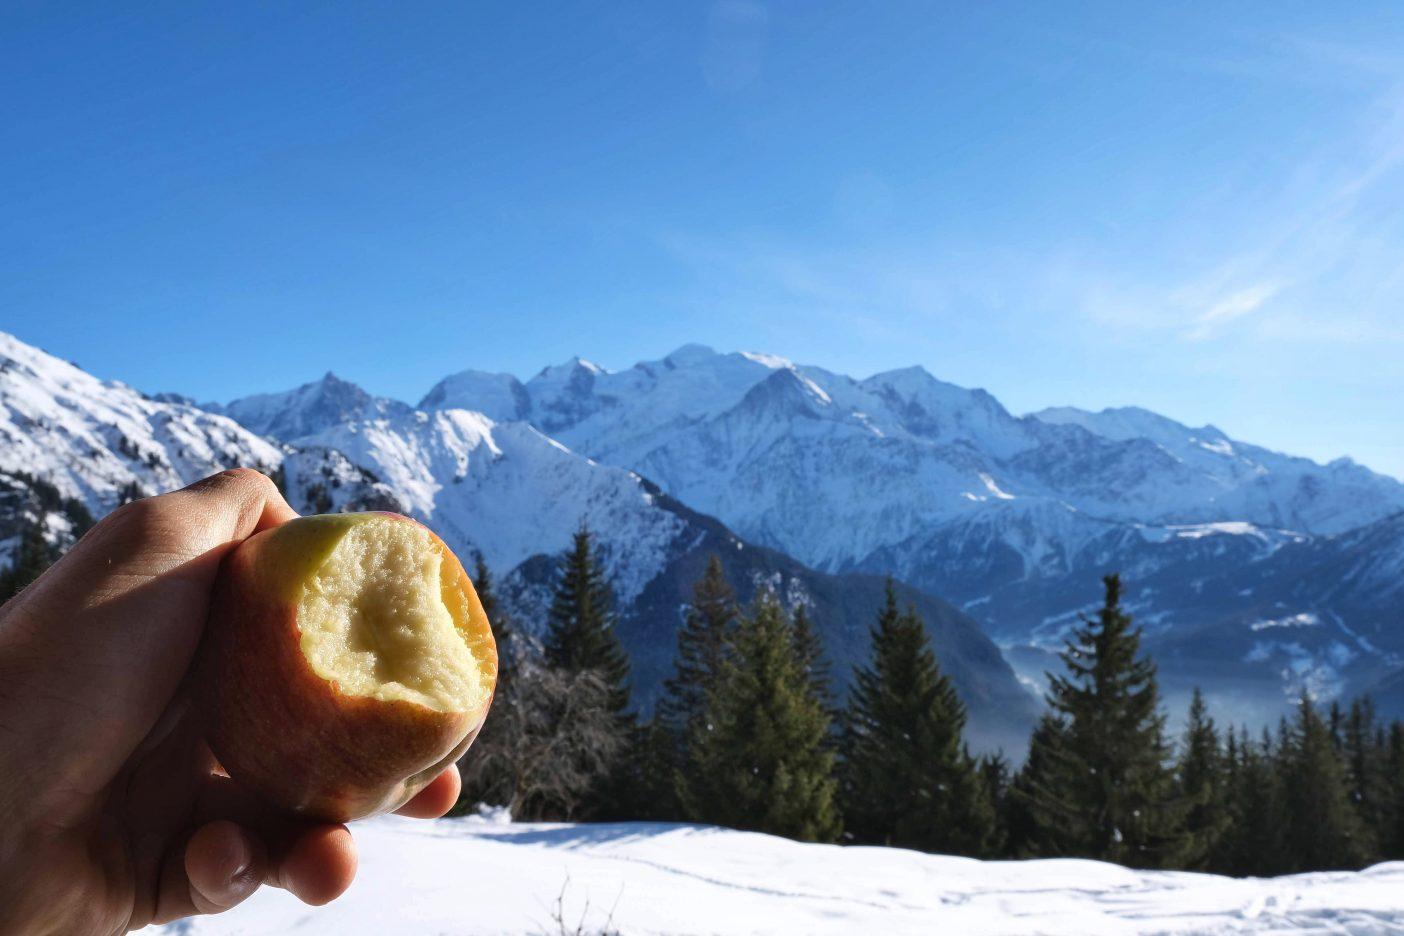 Vegan hiking food with mountain view